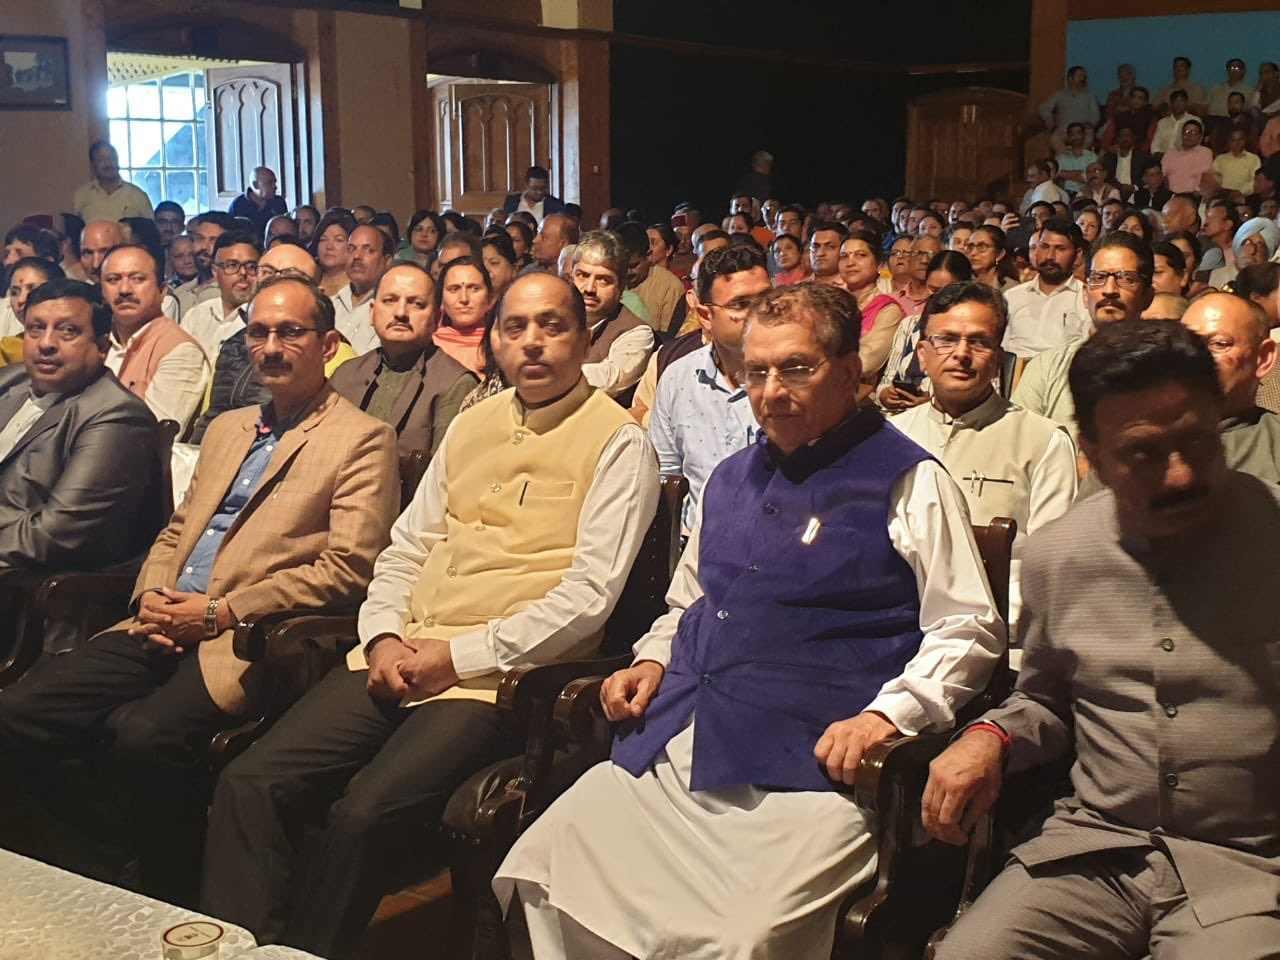 Kuldeep singh rathore pays tribute to araun jaitely